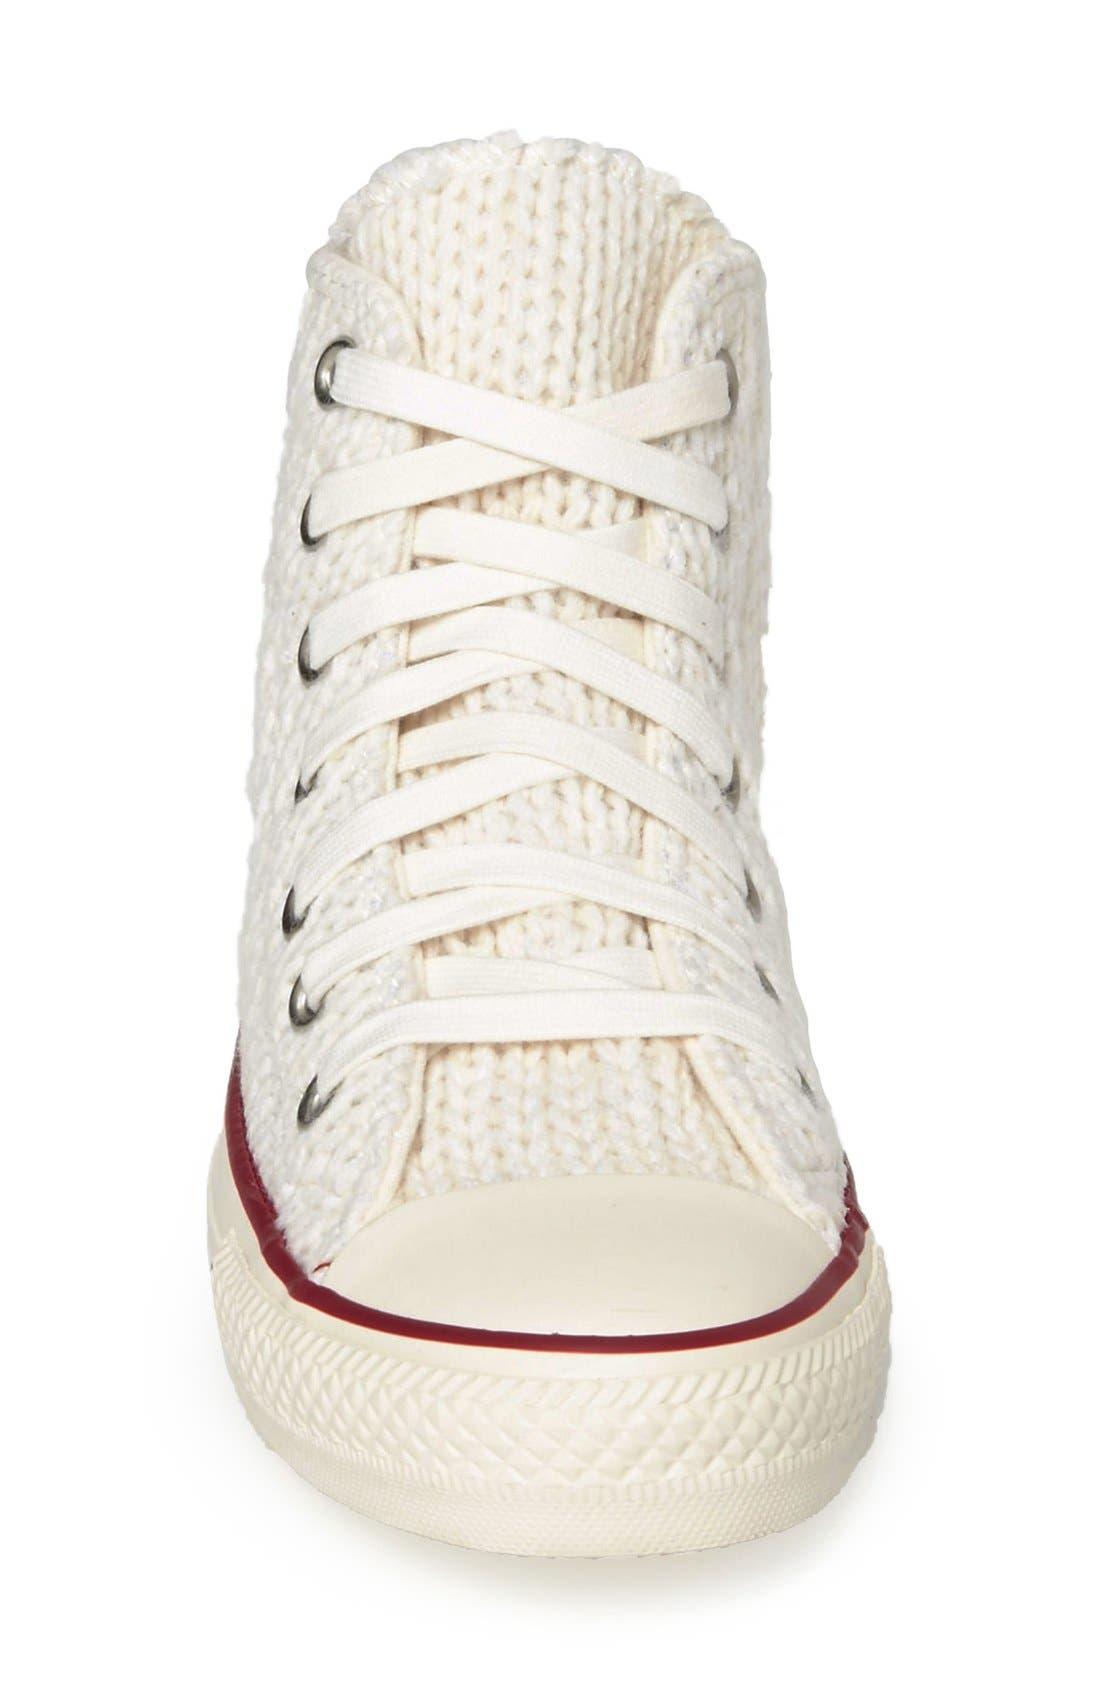 Alternate Image 3  - Converse Chuck Taylor® All Star® 'Winter Knit' High Top Sneaker (Women)